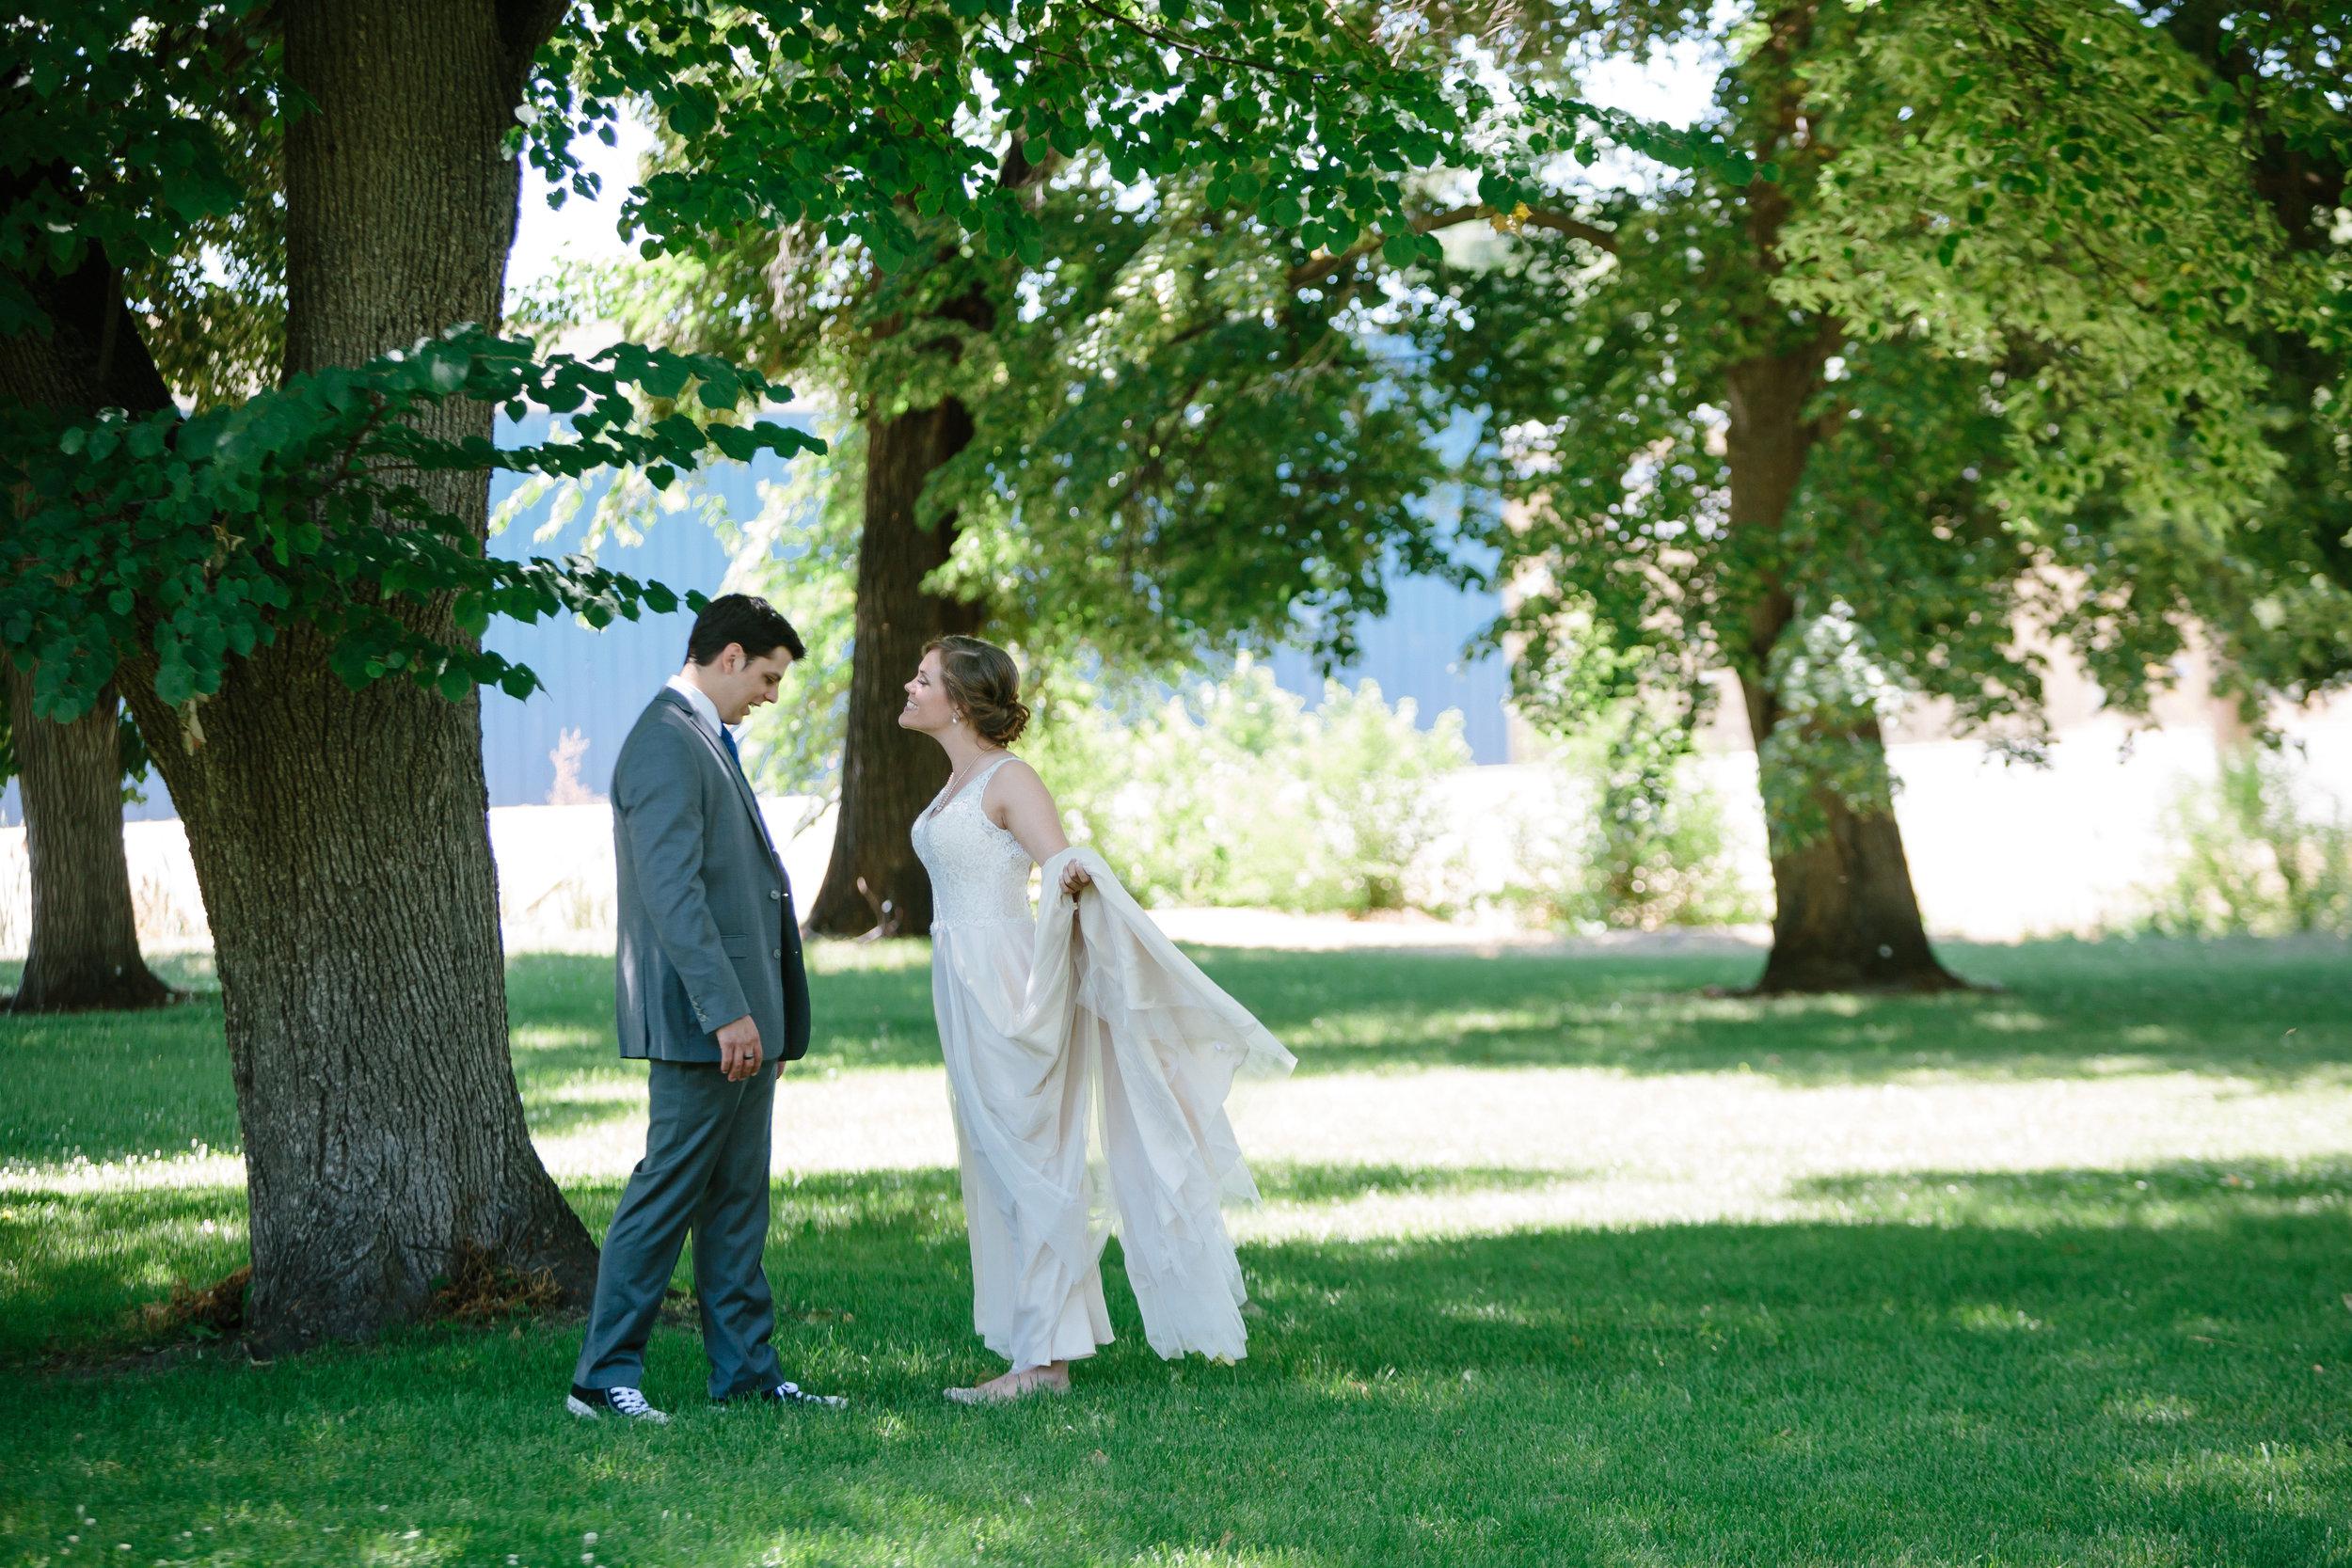 Jordan & Shantel Married - Idaho - Corrie Mick Photography-81.jpg